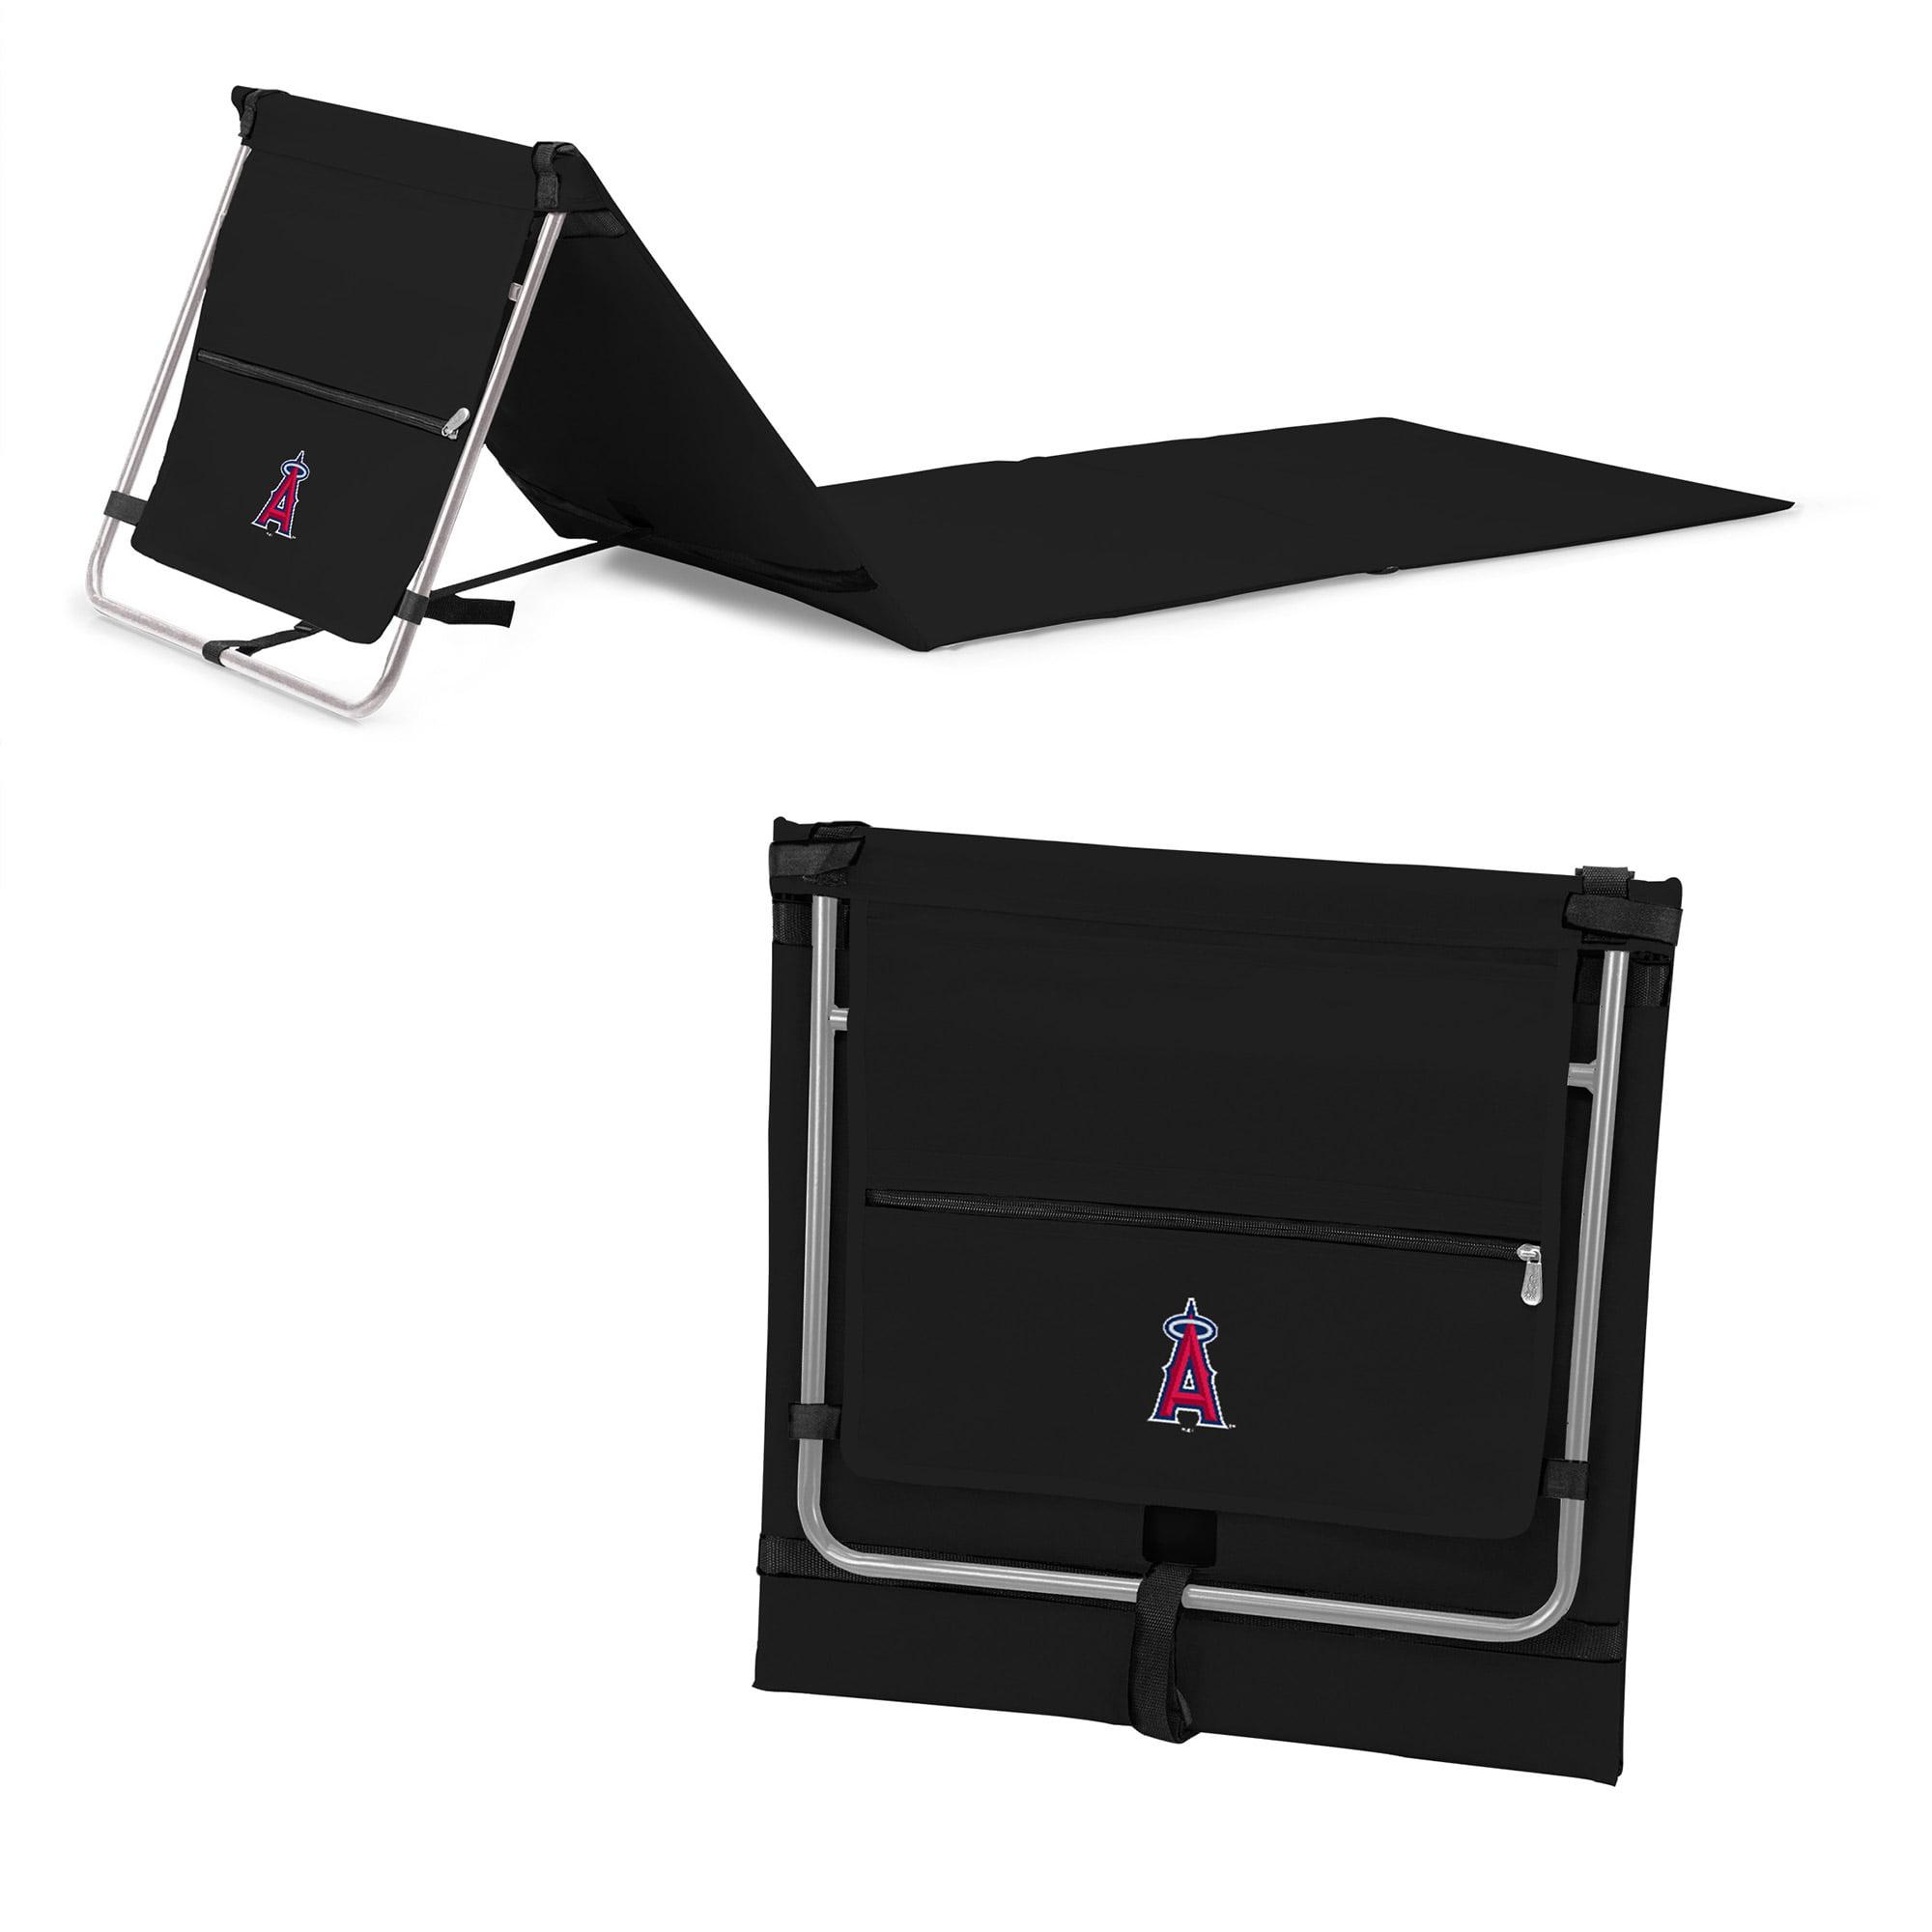 Los Angeles Angels Portable Lounger Beach Mat - Black - No Size